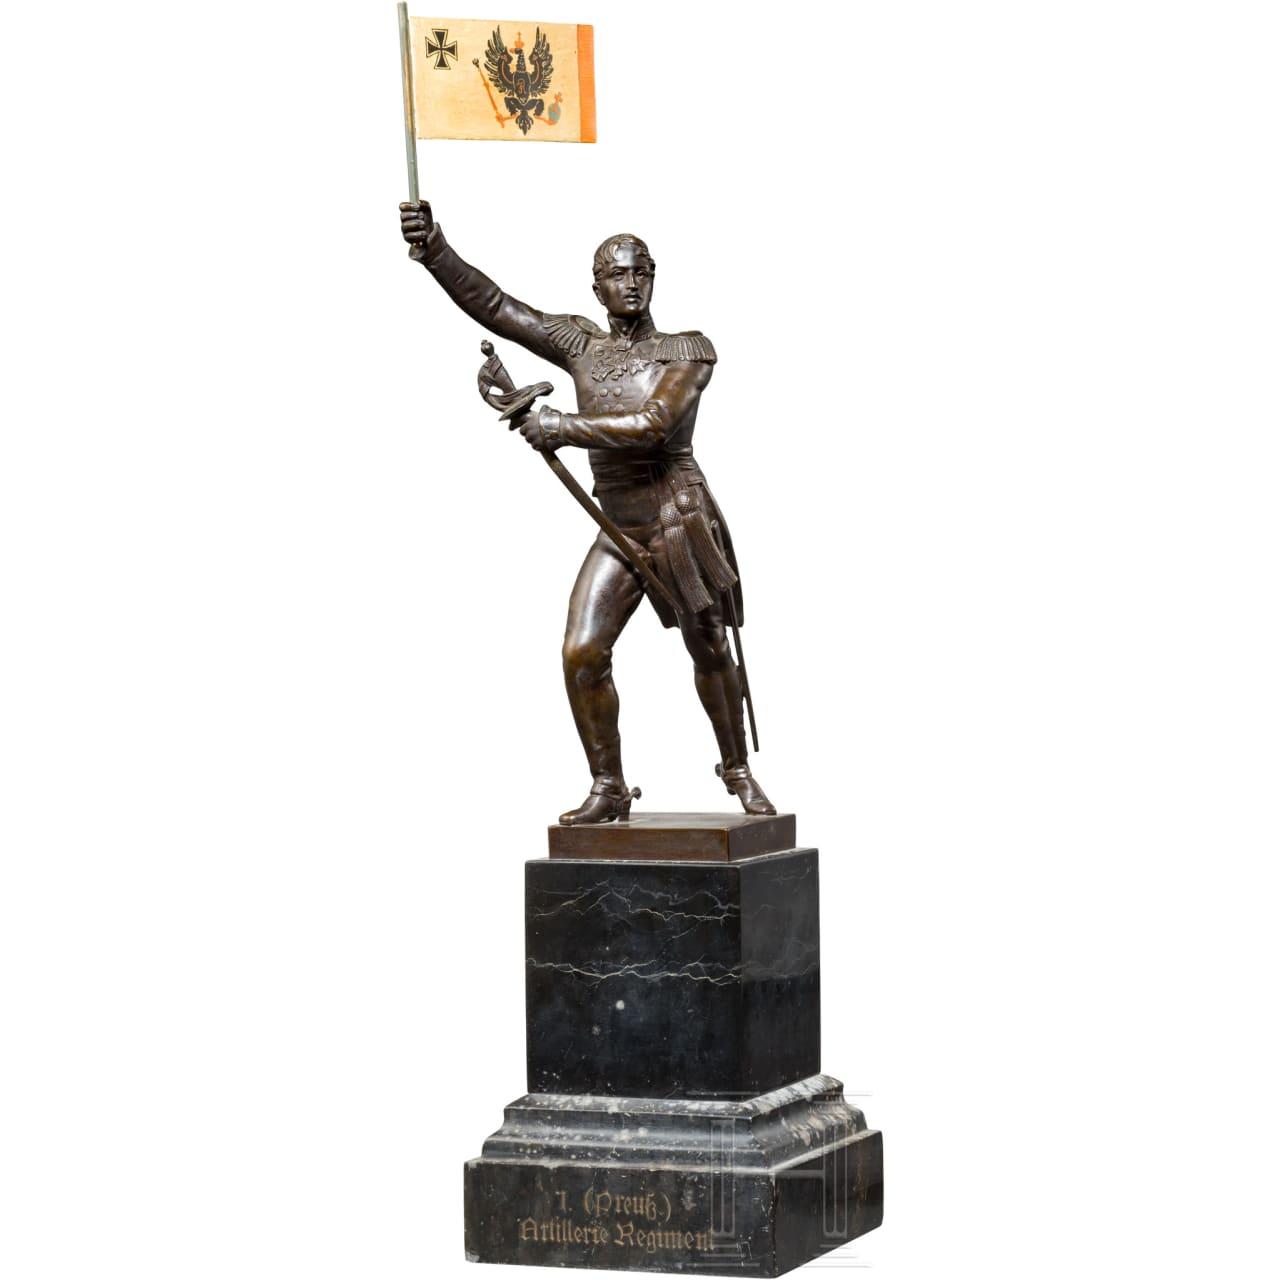 King Friedrich Wilhelm III. of Prussia (1770 - 1840) - bronze statue